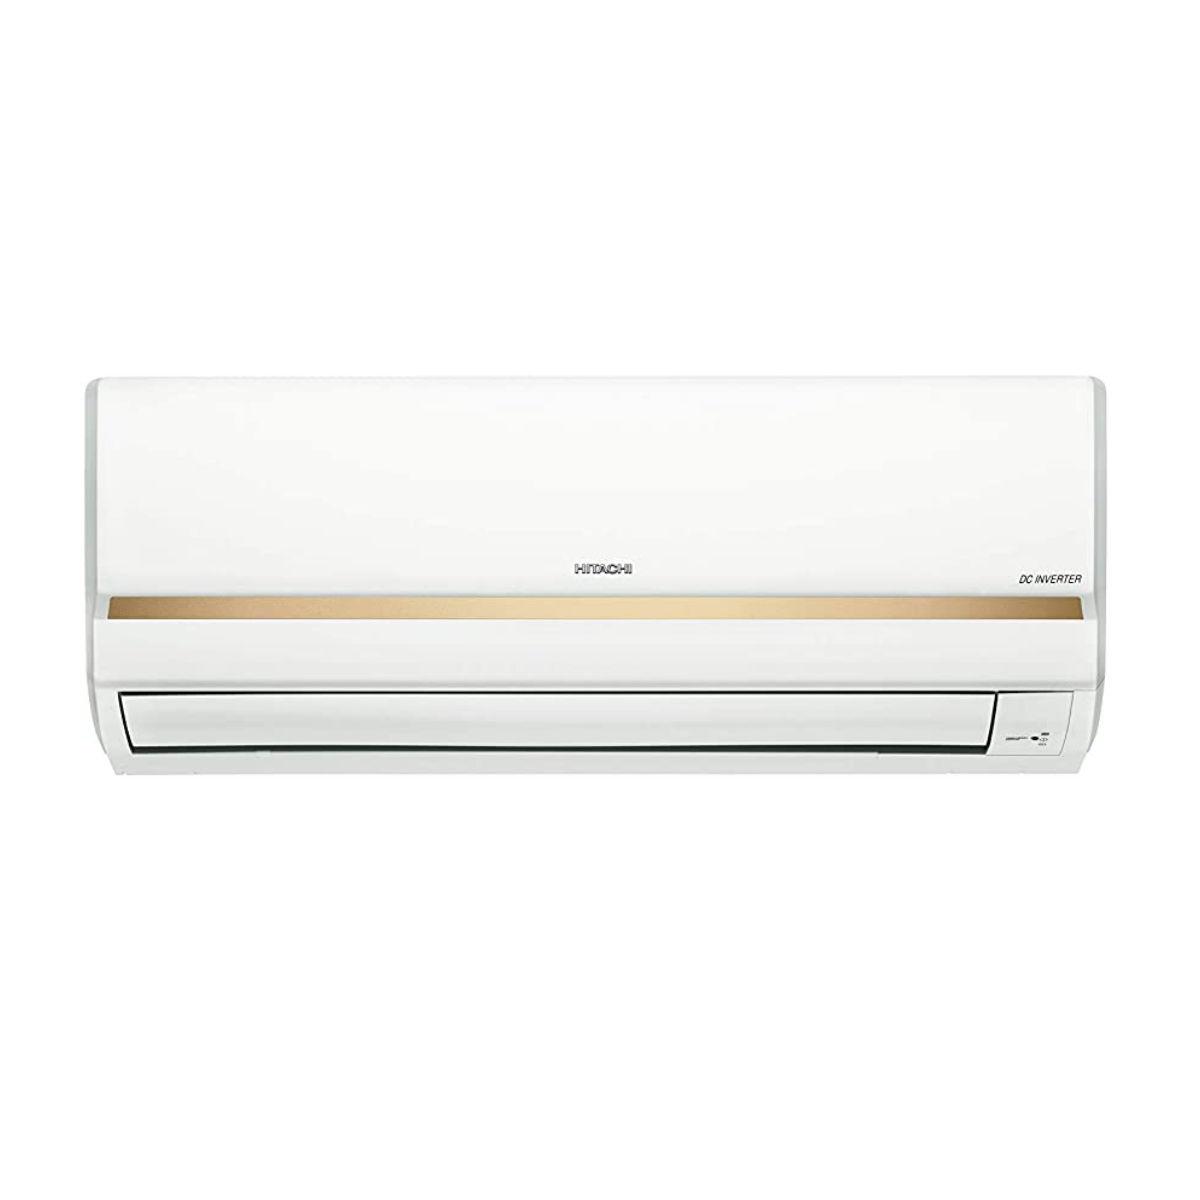 हिताची RSFG512HCEA 1 Ton 5 Star Inverter Split Air Conditioner